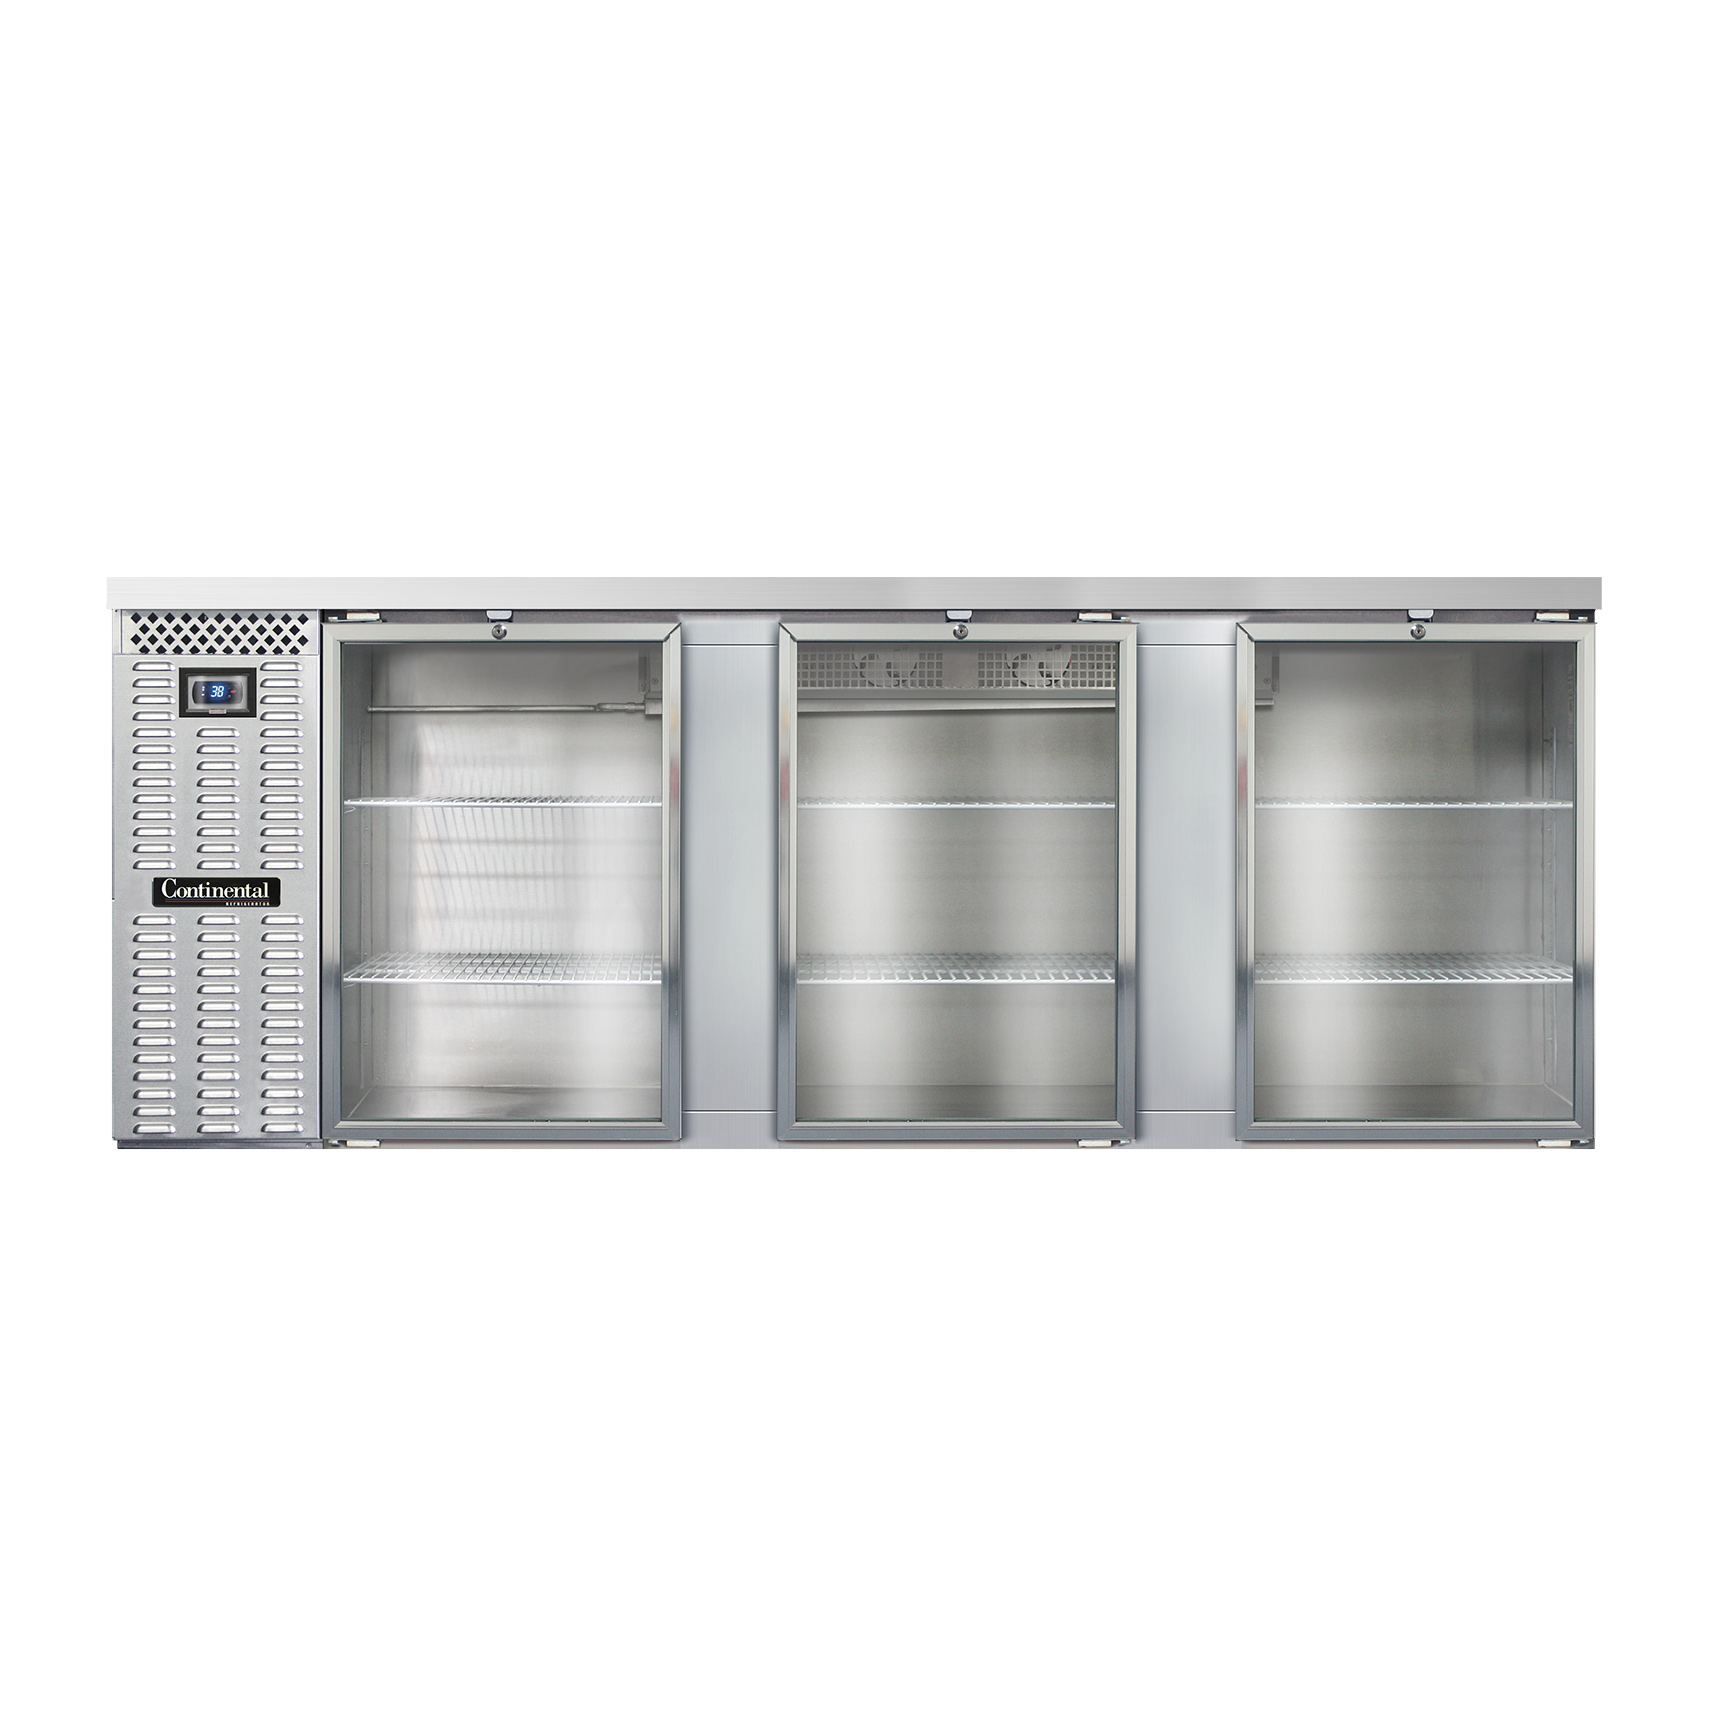 Continental Refrigerator BB90NSSGD back bar cabinet, refrigerated